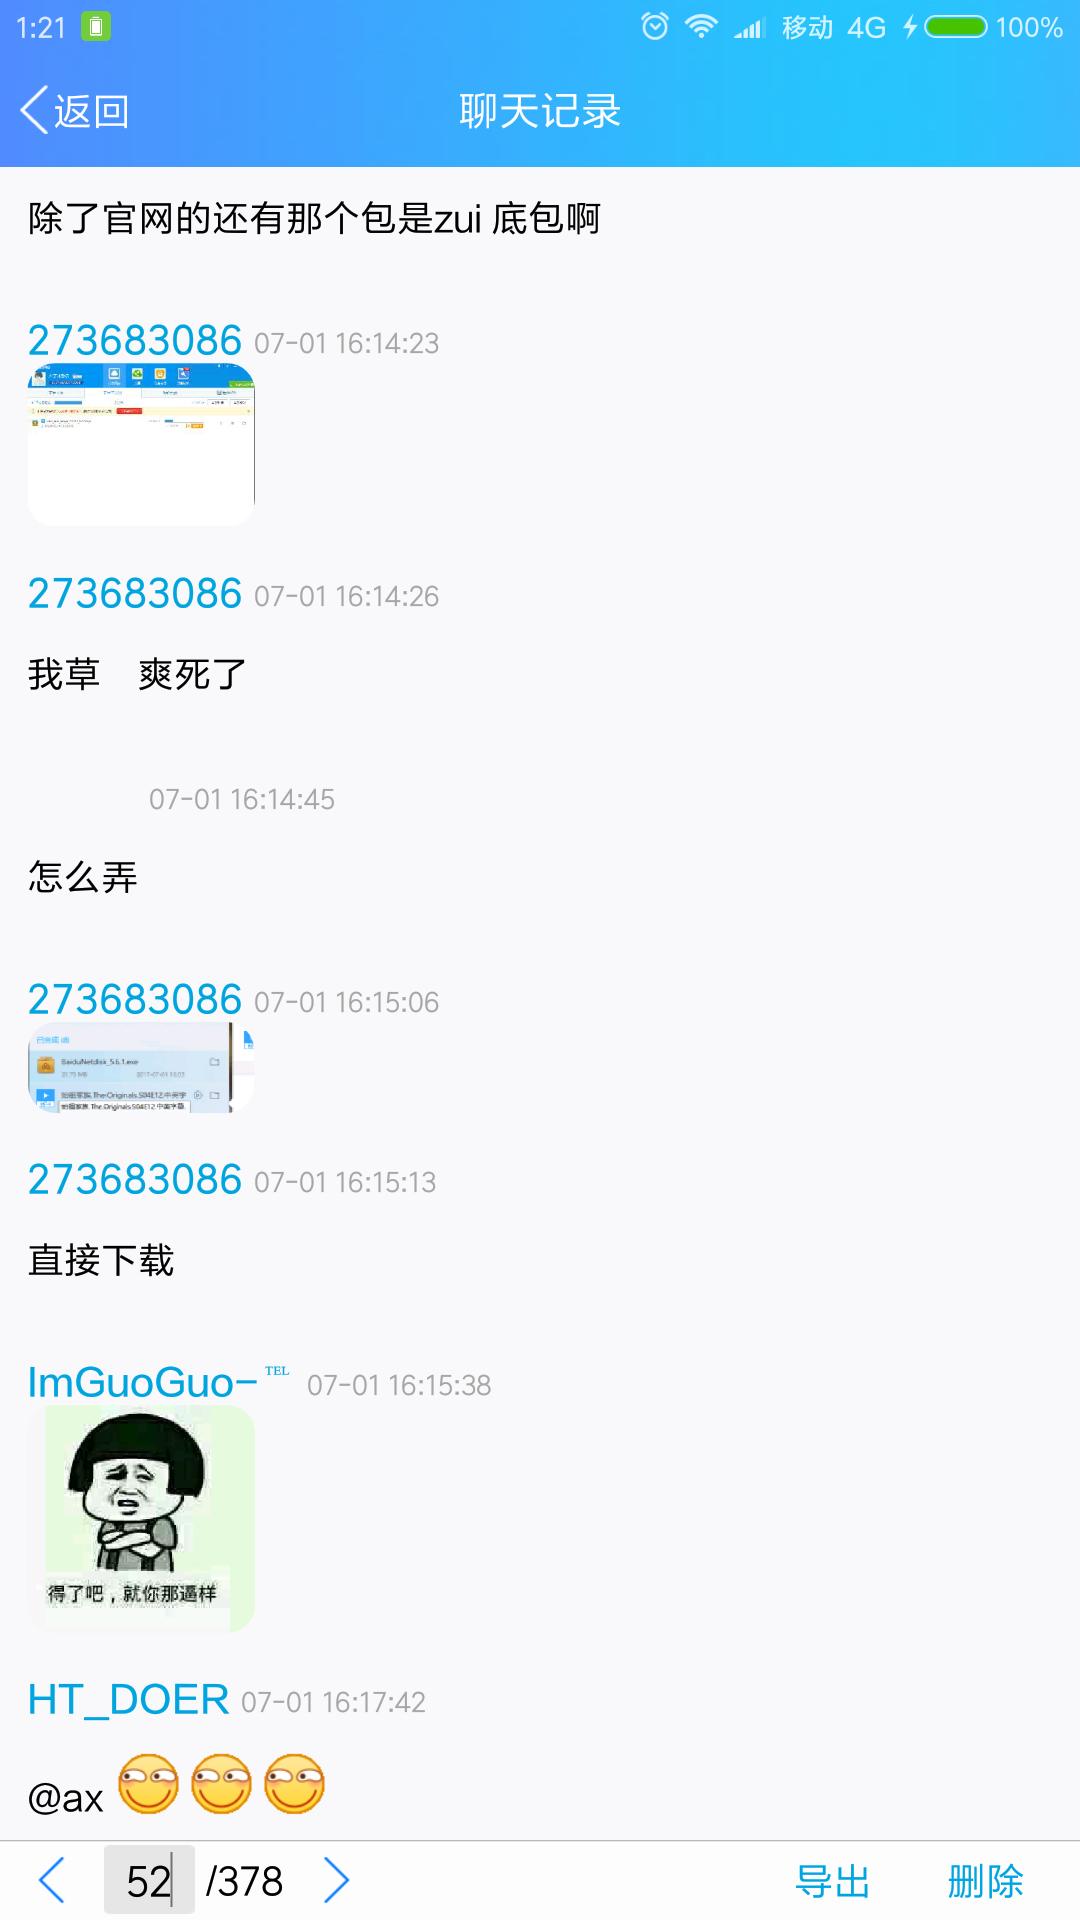 Screenshot_2017-07-09-01-21-46-002_com.tencent.mobileqq.png